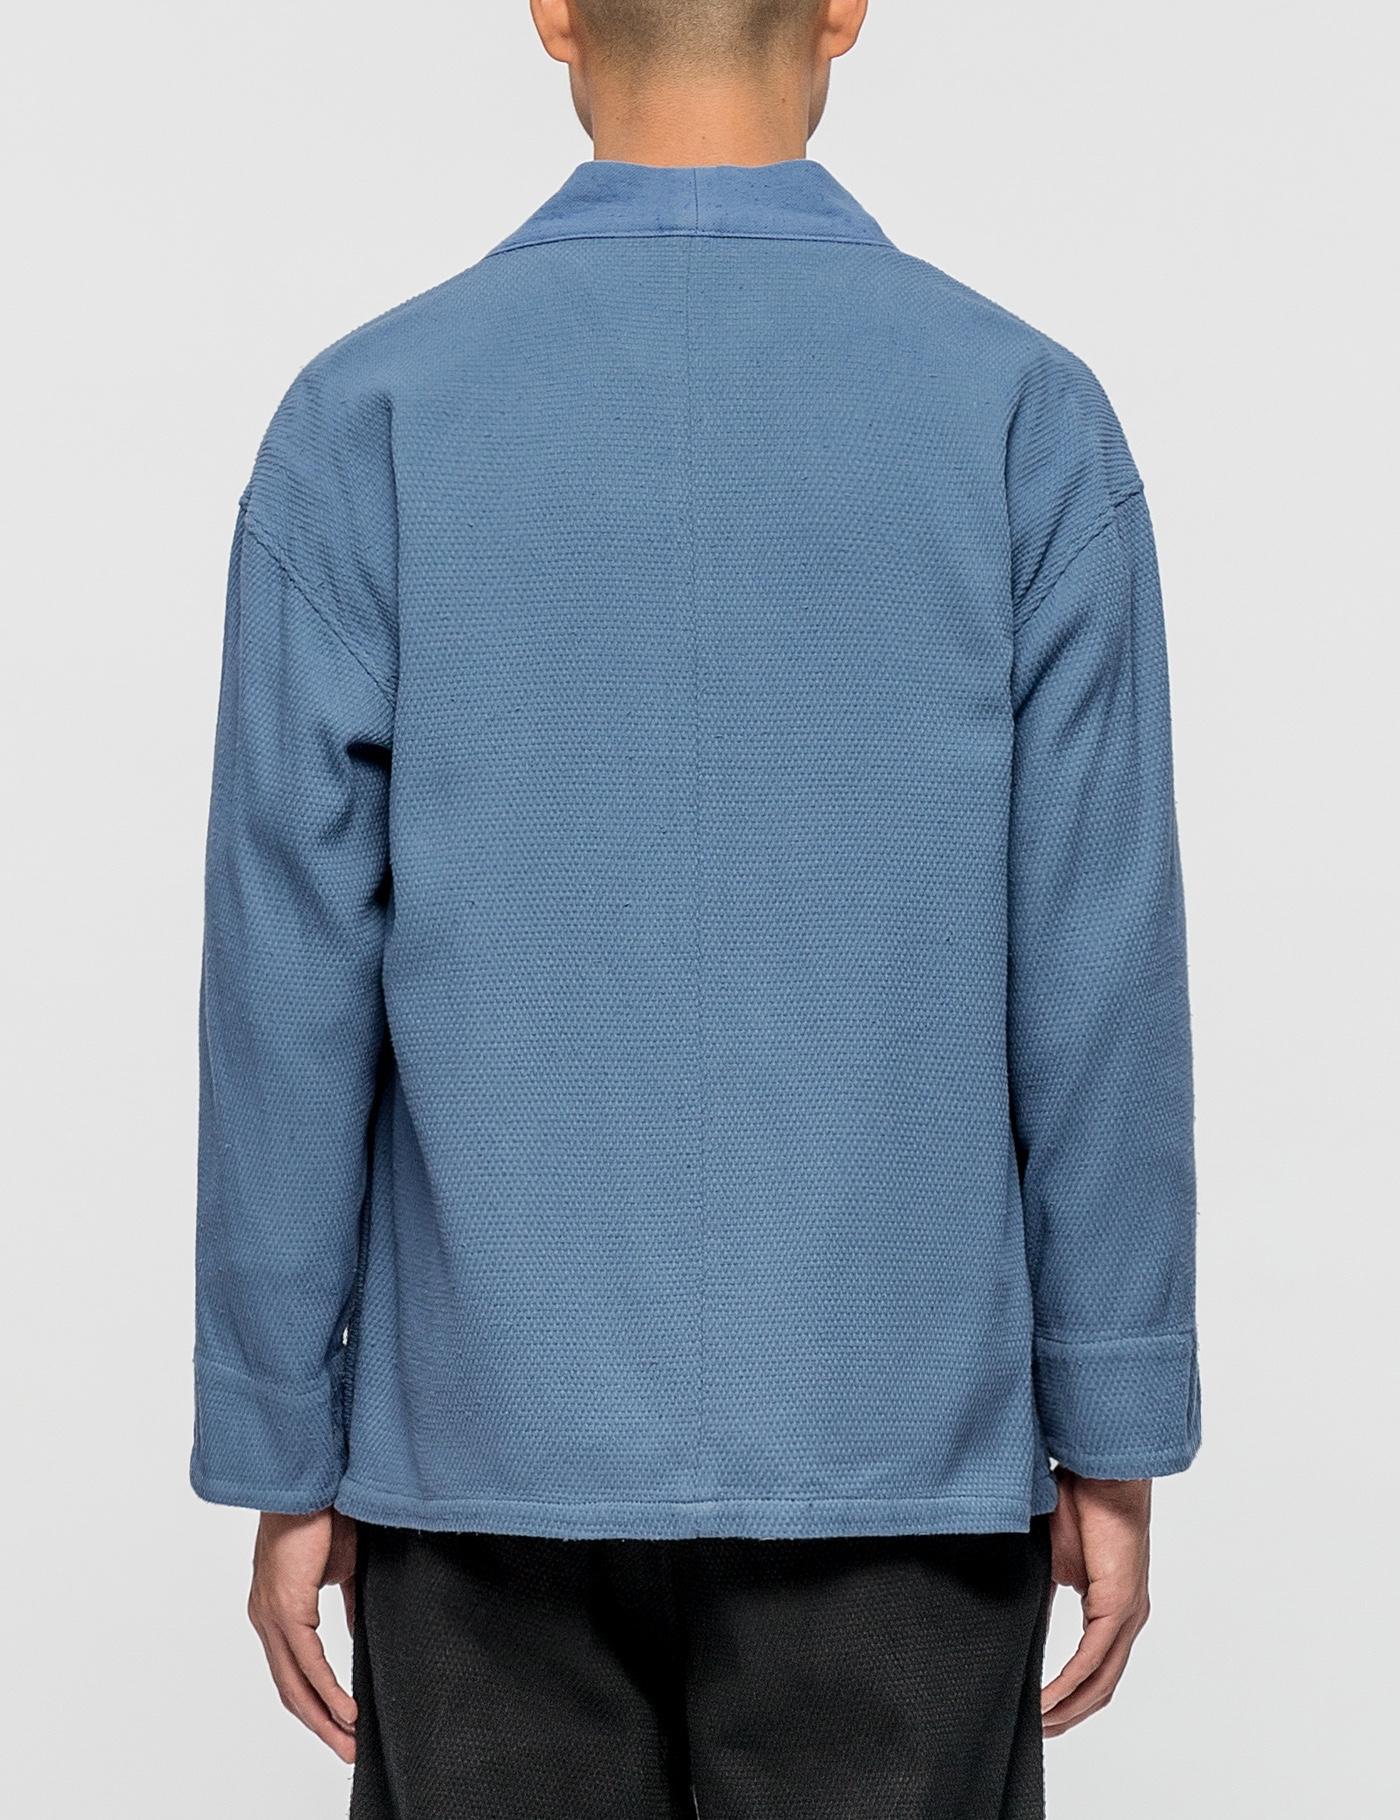 Sasquatchfabrix Cotton Sashiko Hanten Jacket in Blue for Men